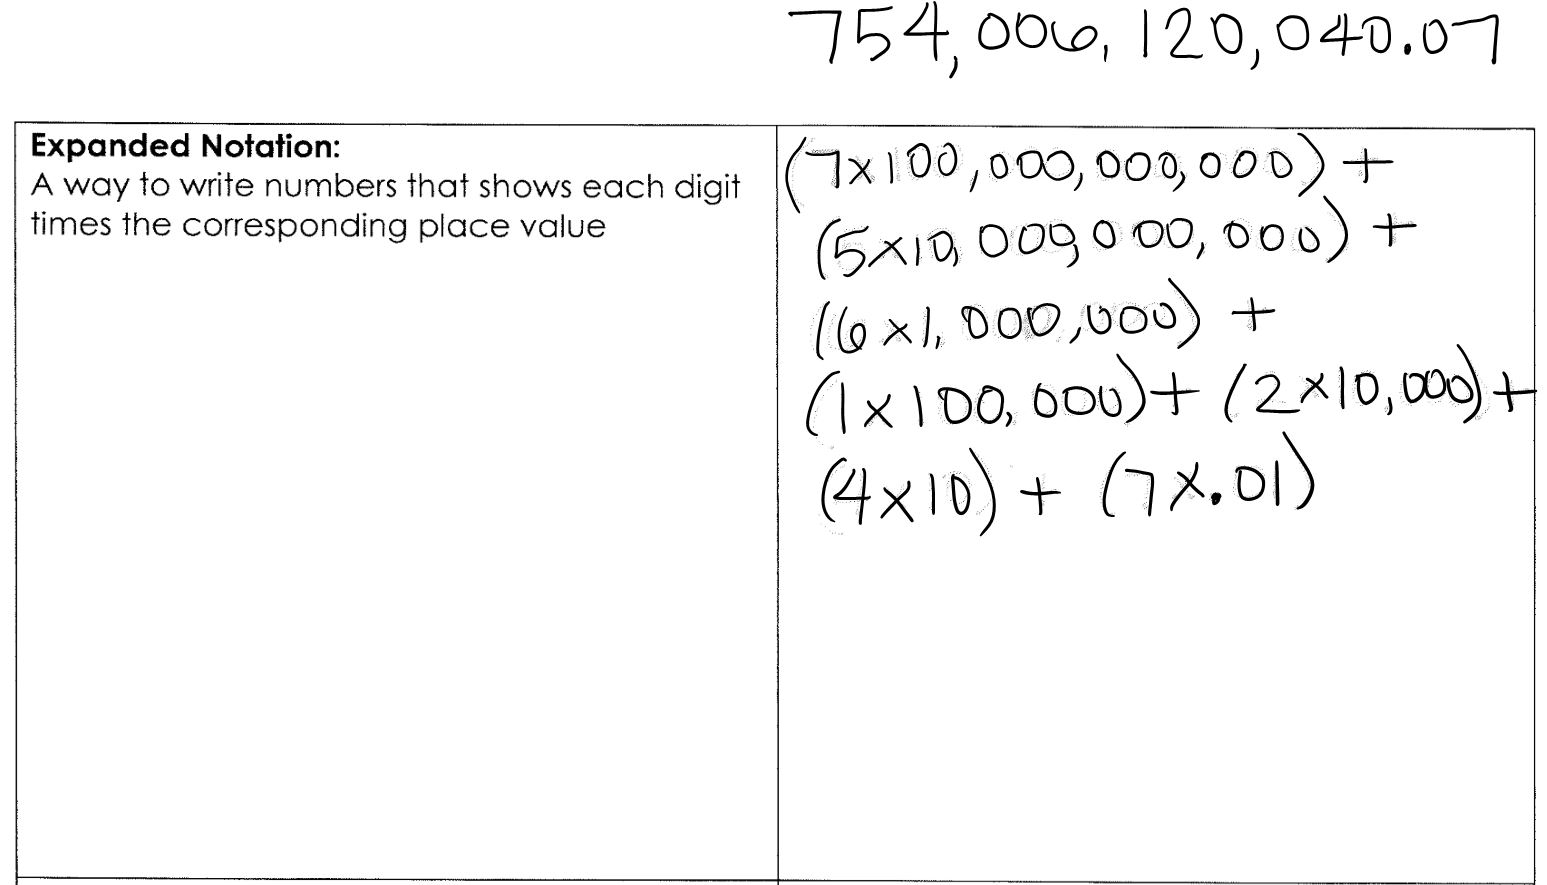 Pannia meredith rieth amelia number sense 91317 expanded notation falaconquin